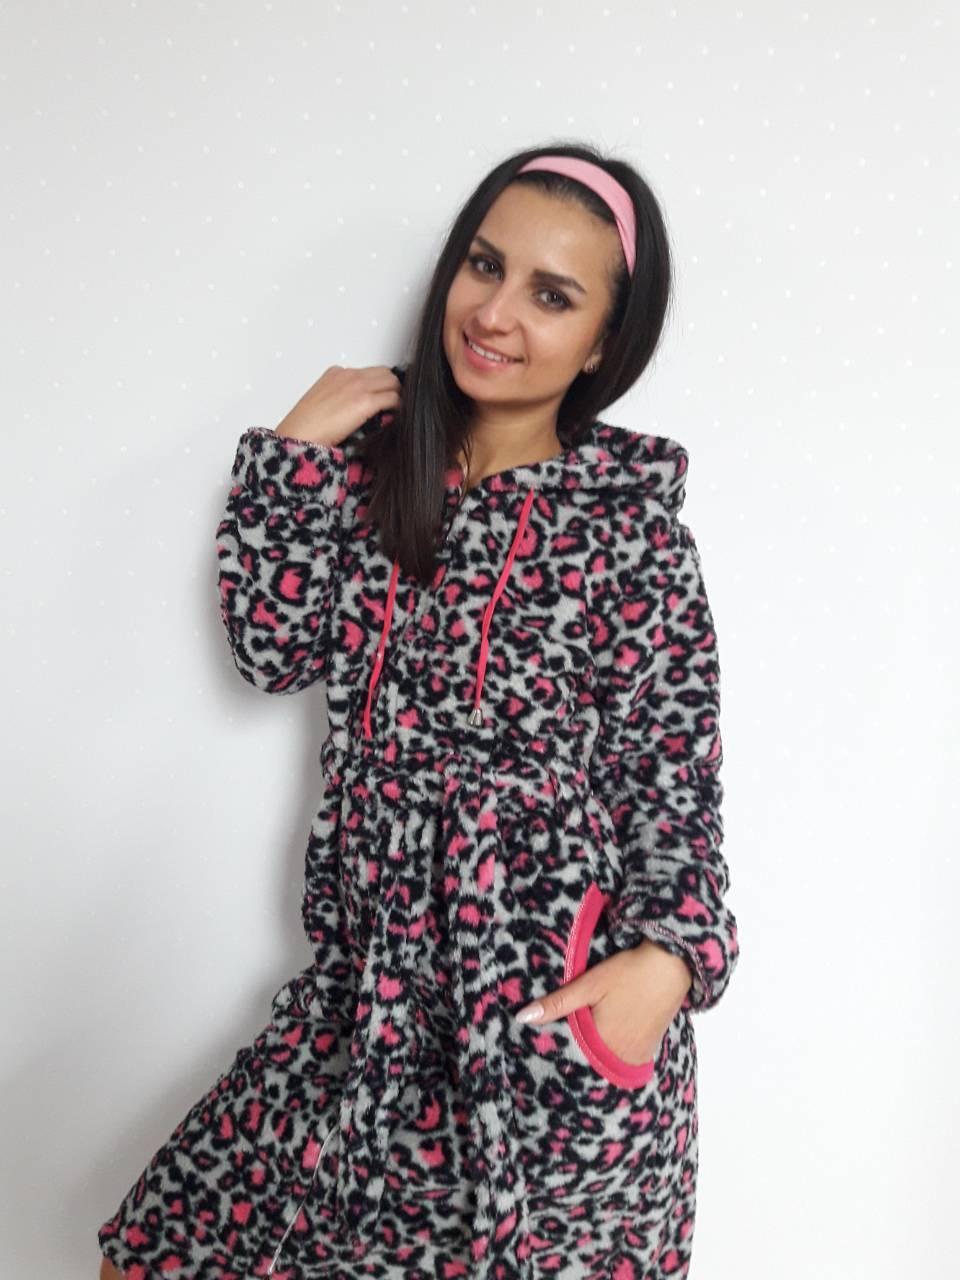 b6b448b730f6 Женский махровый халат на замке (S, L, XL) розовый леопард, цена 328 ...